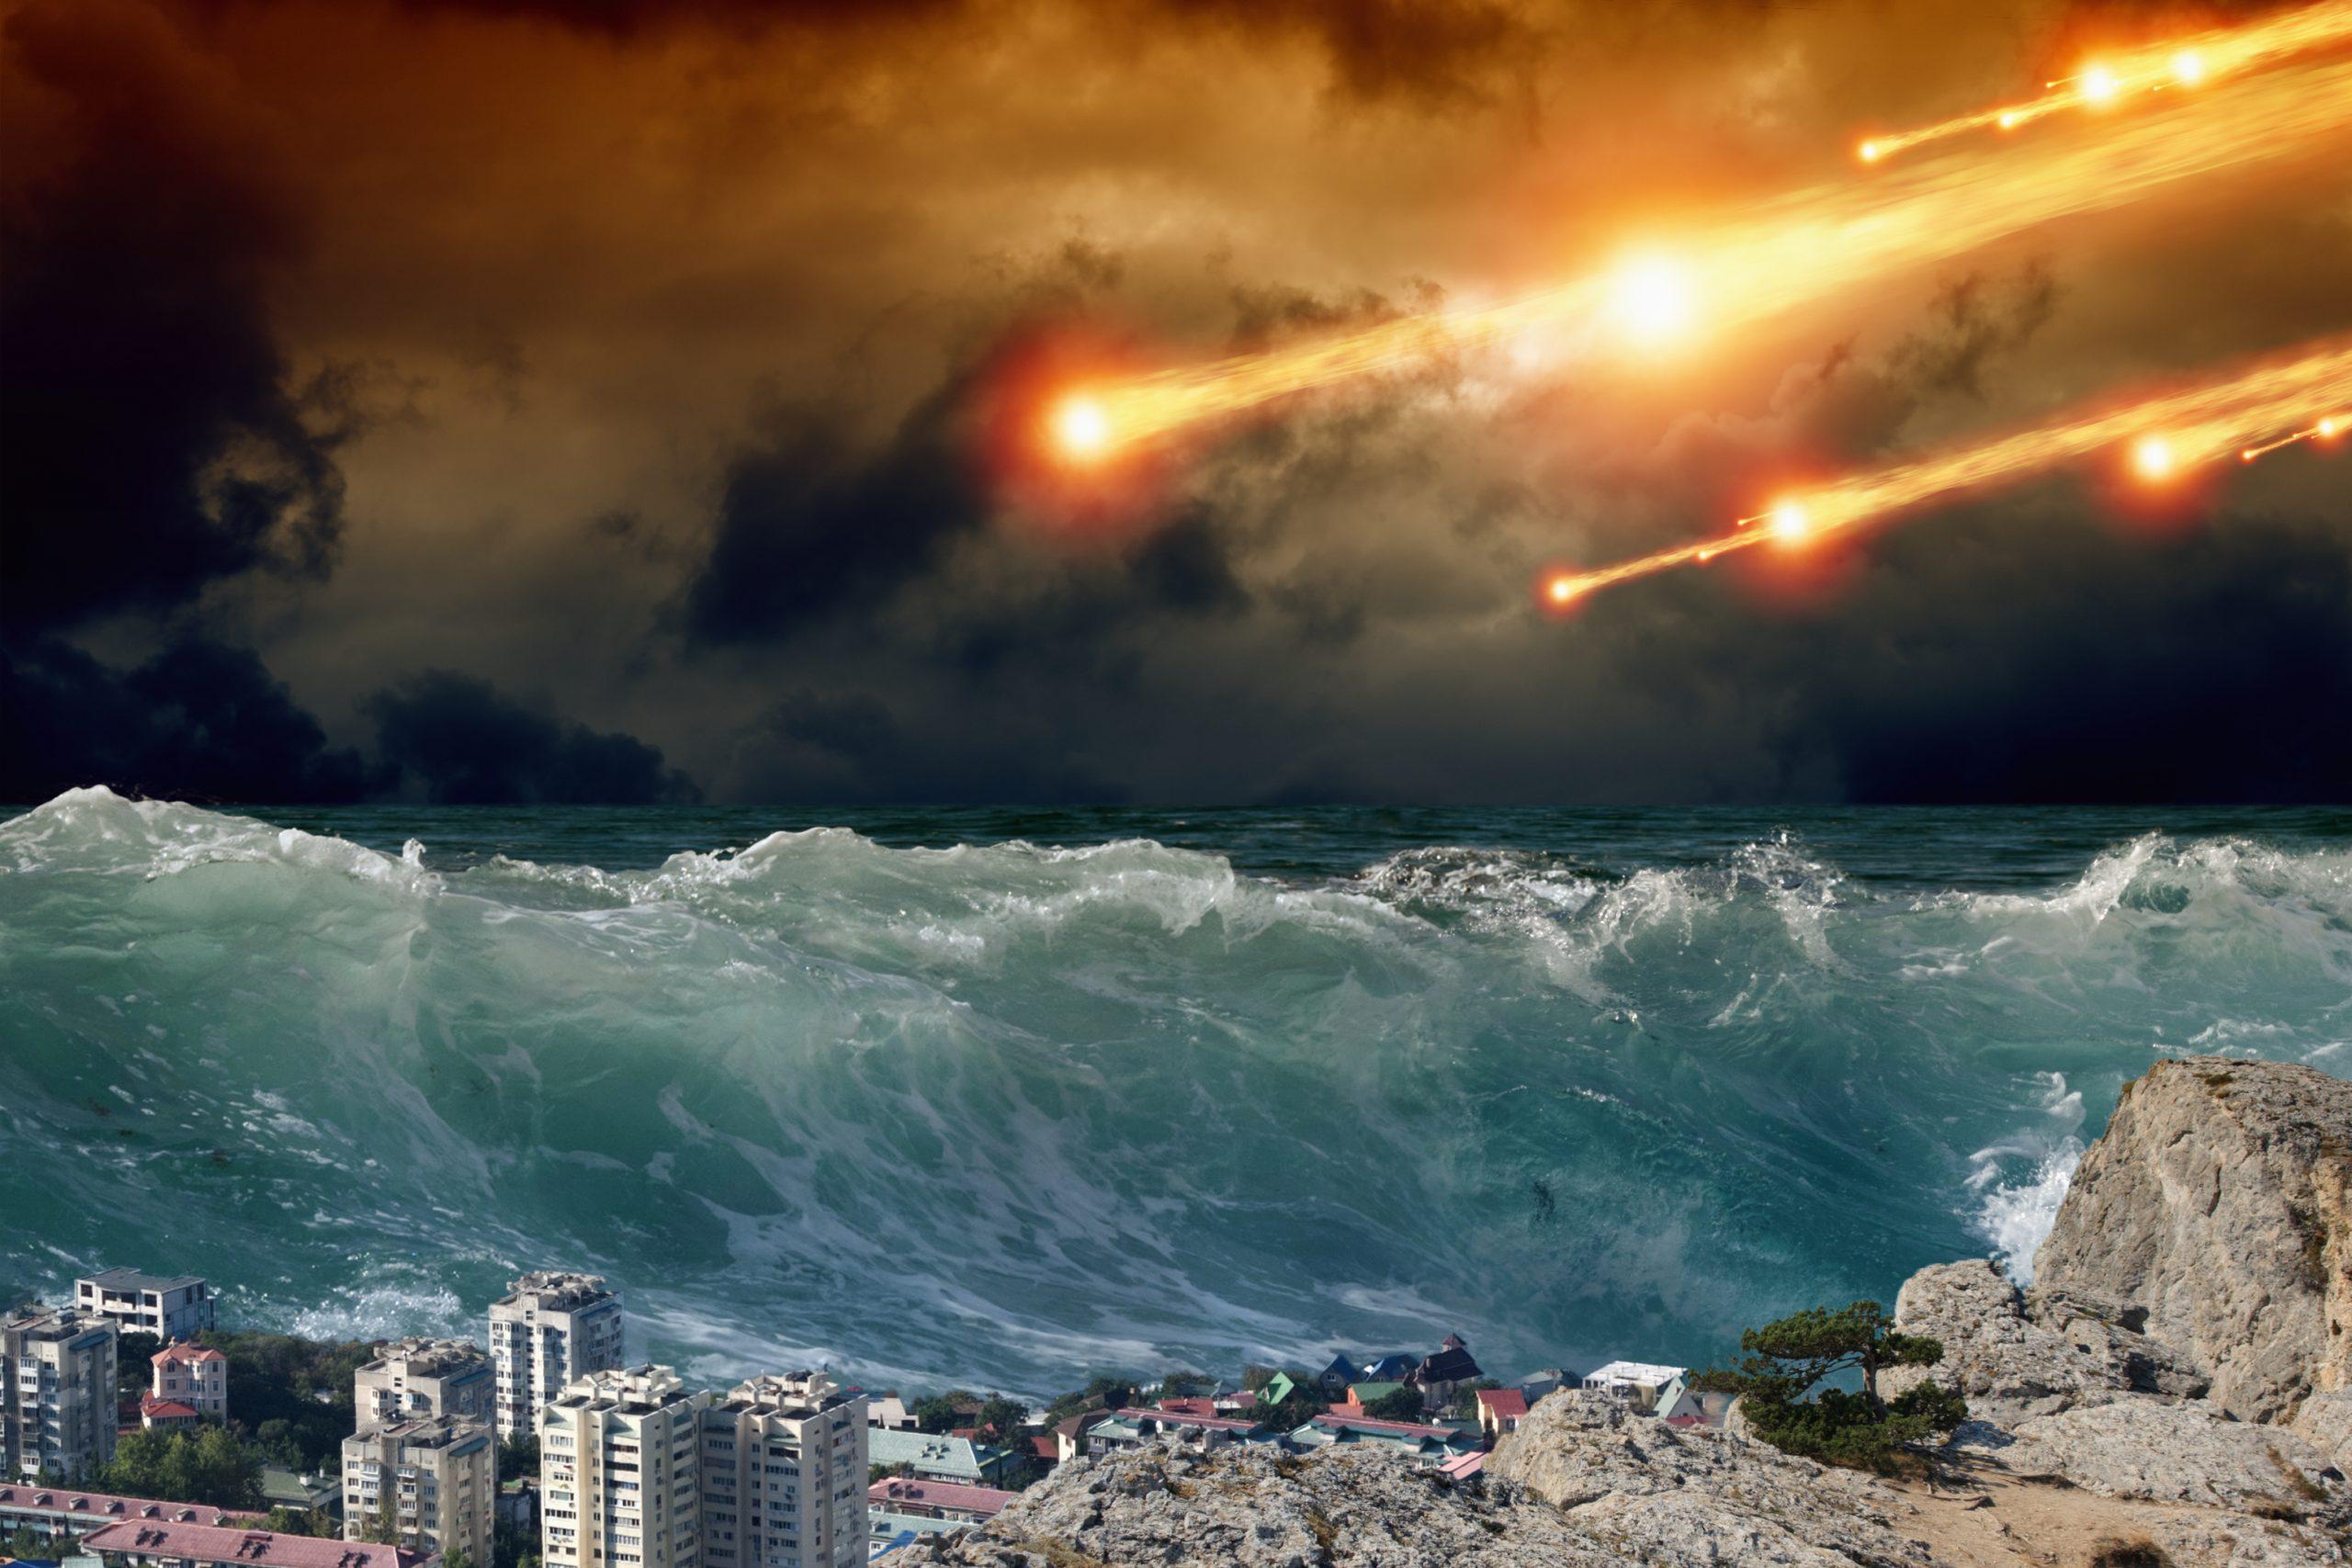 Apocalipsis: el misterioso fin del mundo según la Biblia